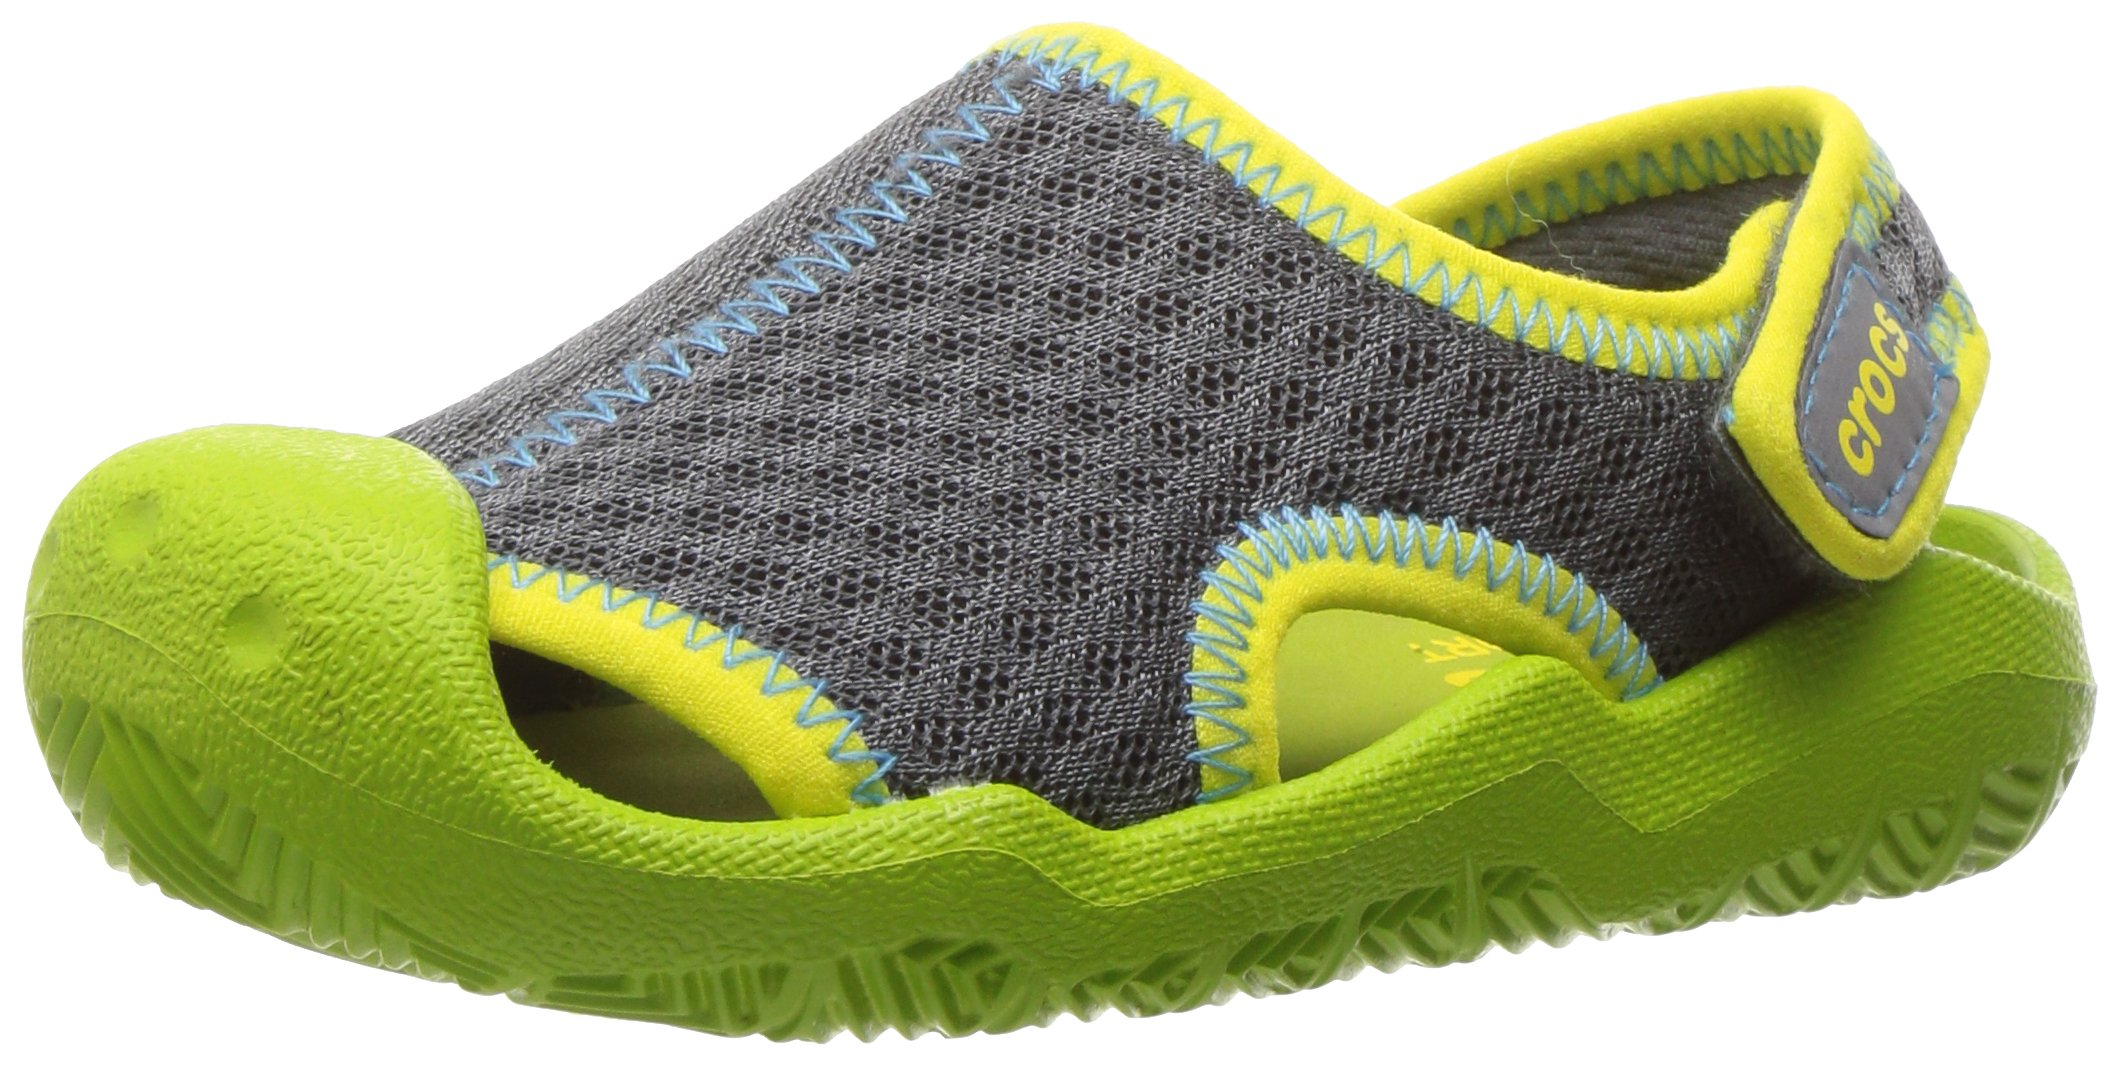 Crocs Kids' Swiftwater Sandal,Graphite/Volt Green,9 M US Toddler